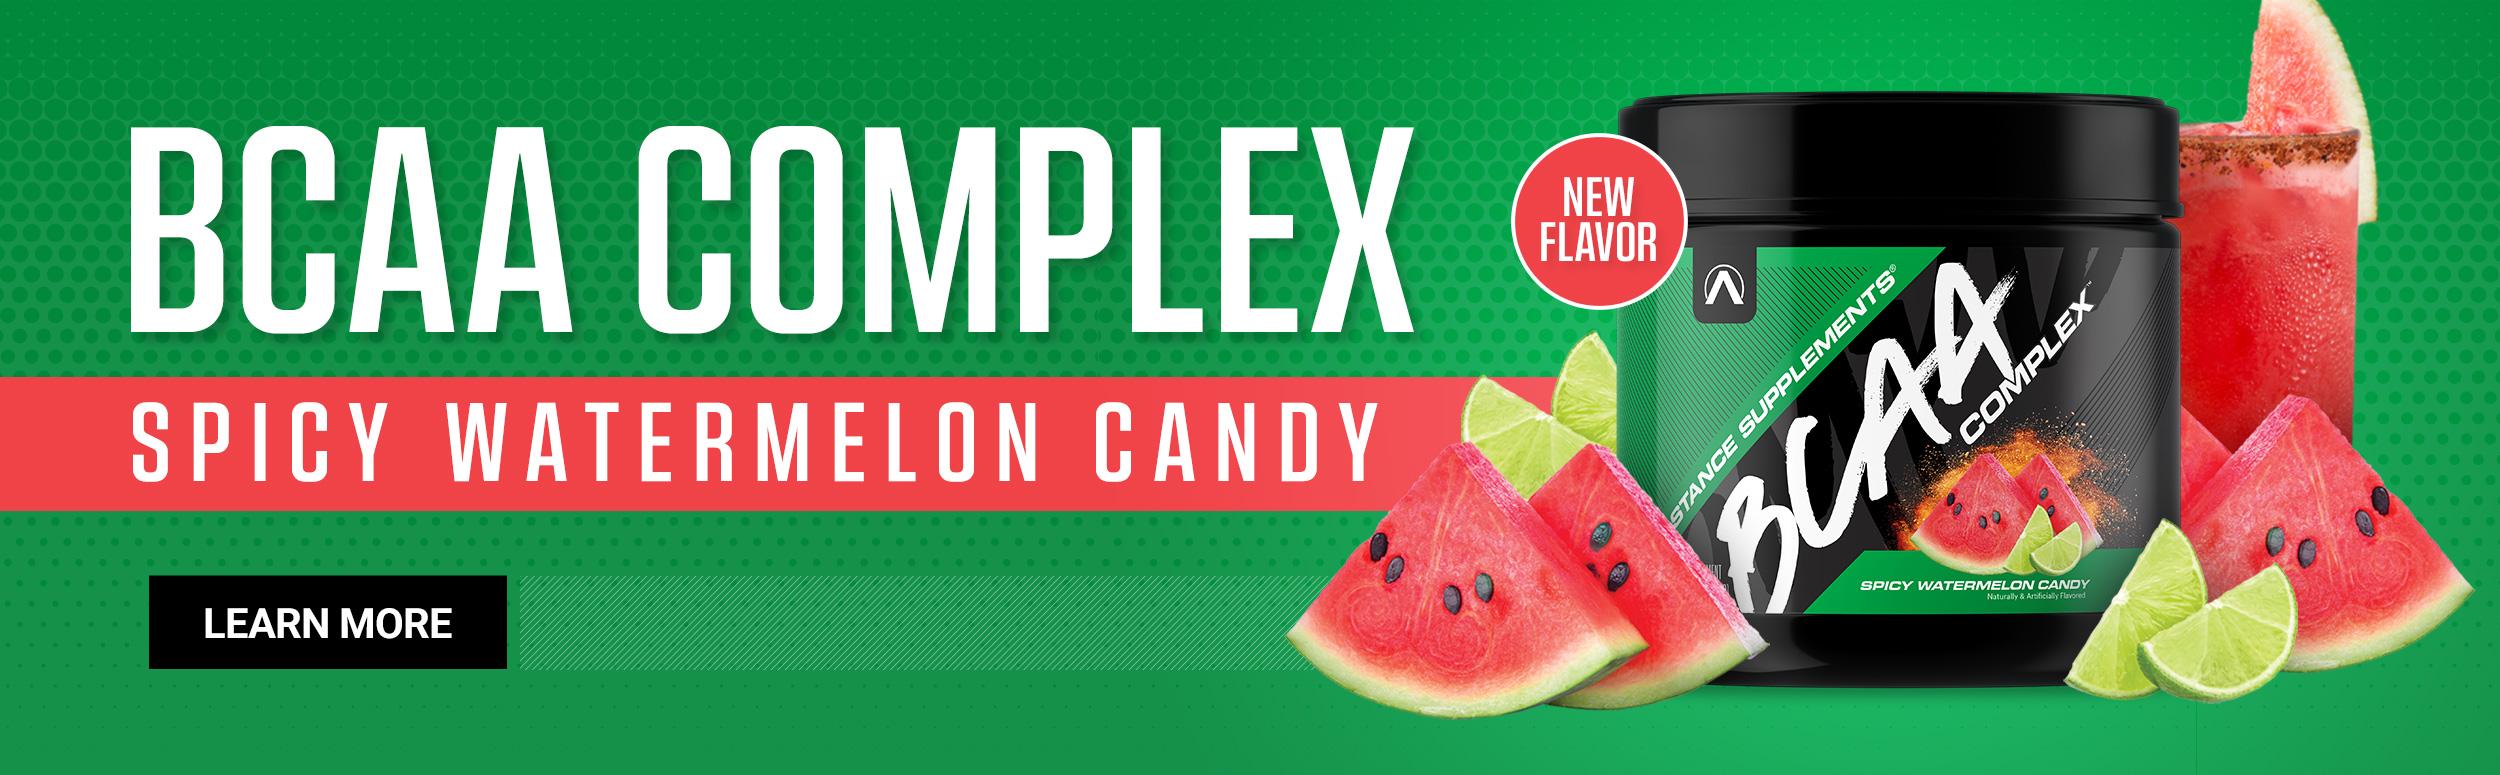 BCAA Complex Spicy Watermelon Banner Ad